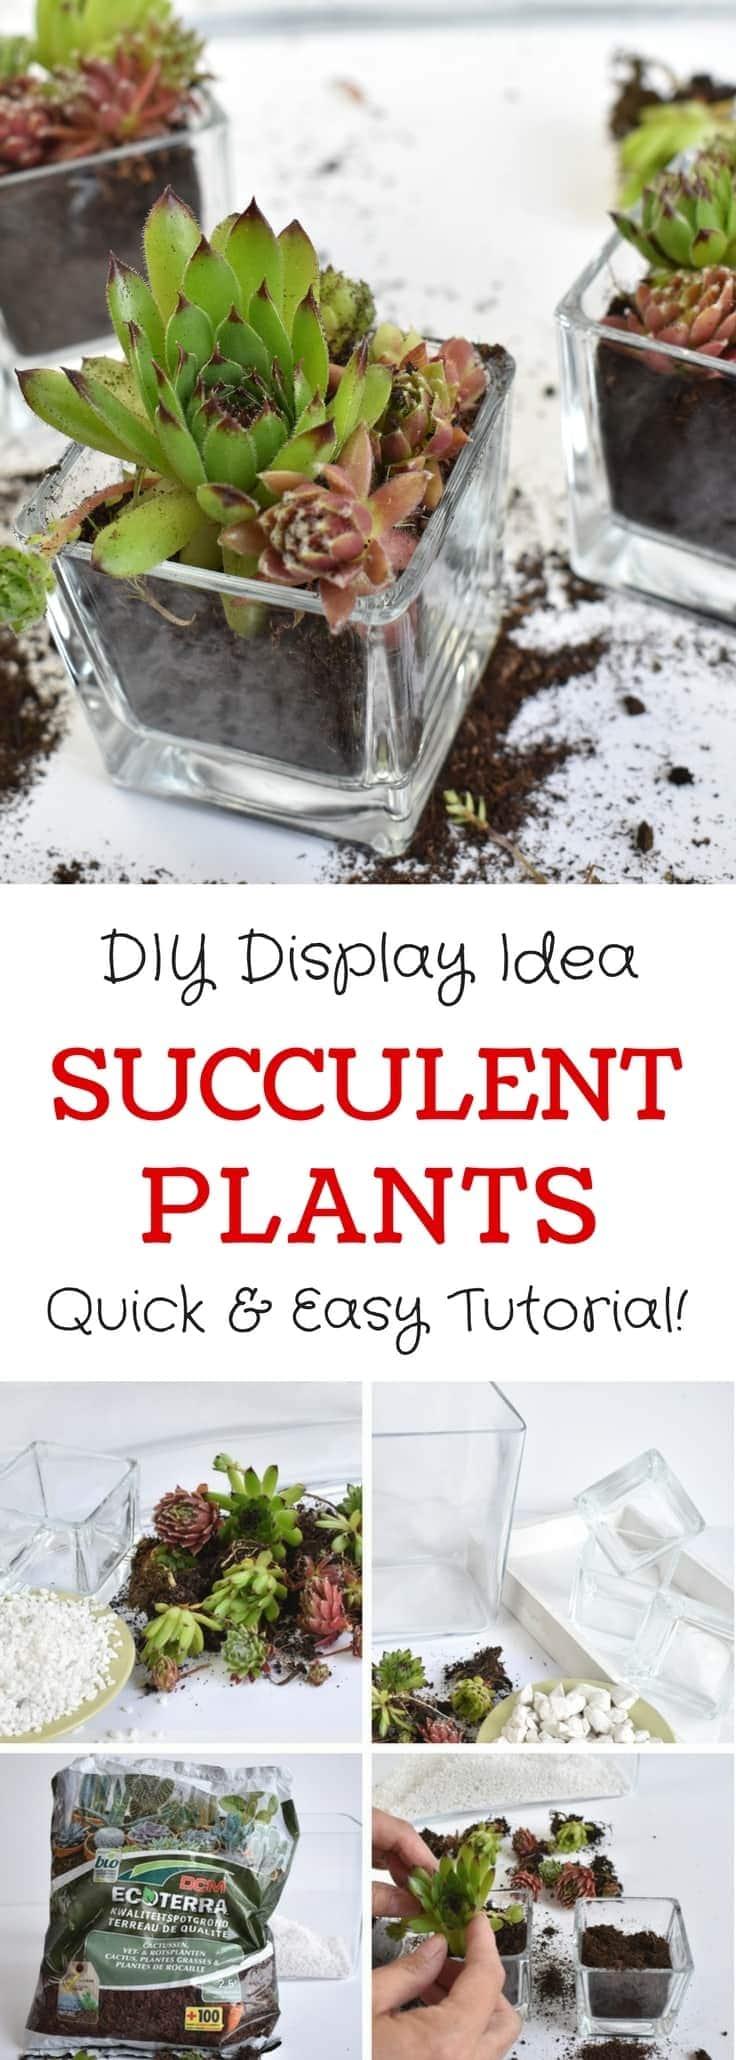 Simple & Stylish DIY Succulent Plant Display Idea